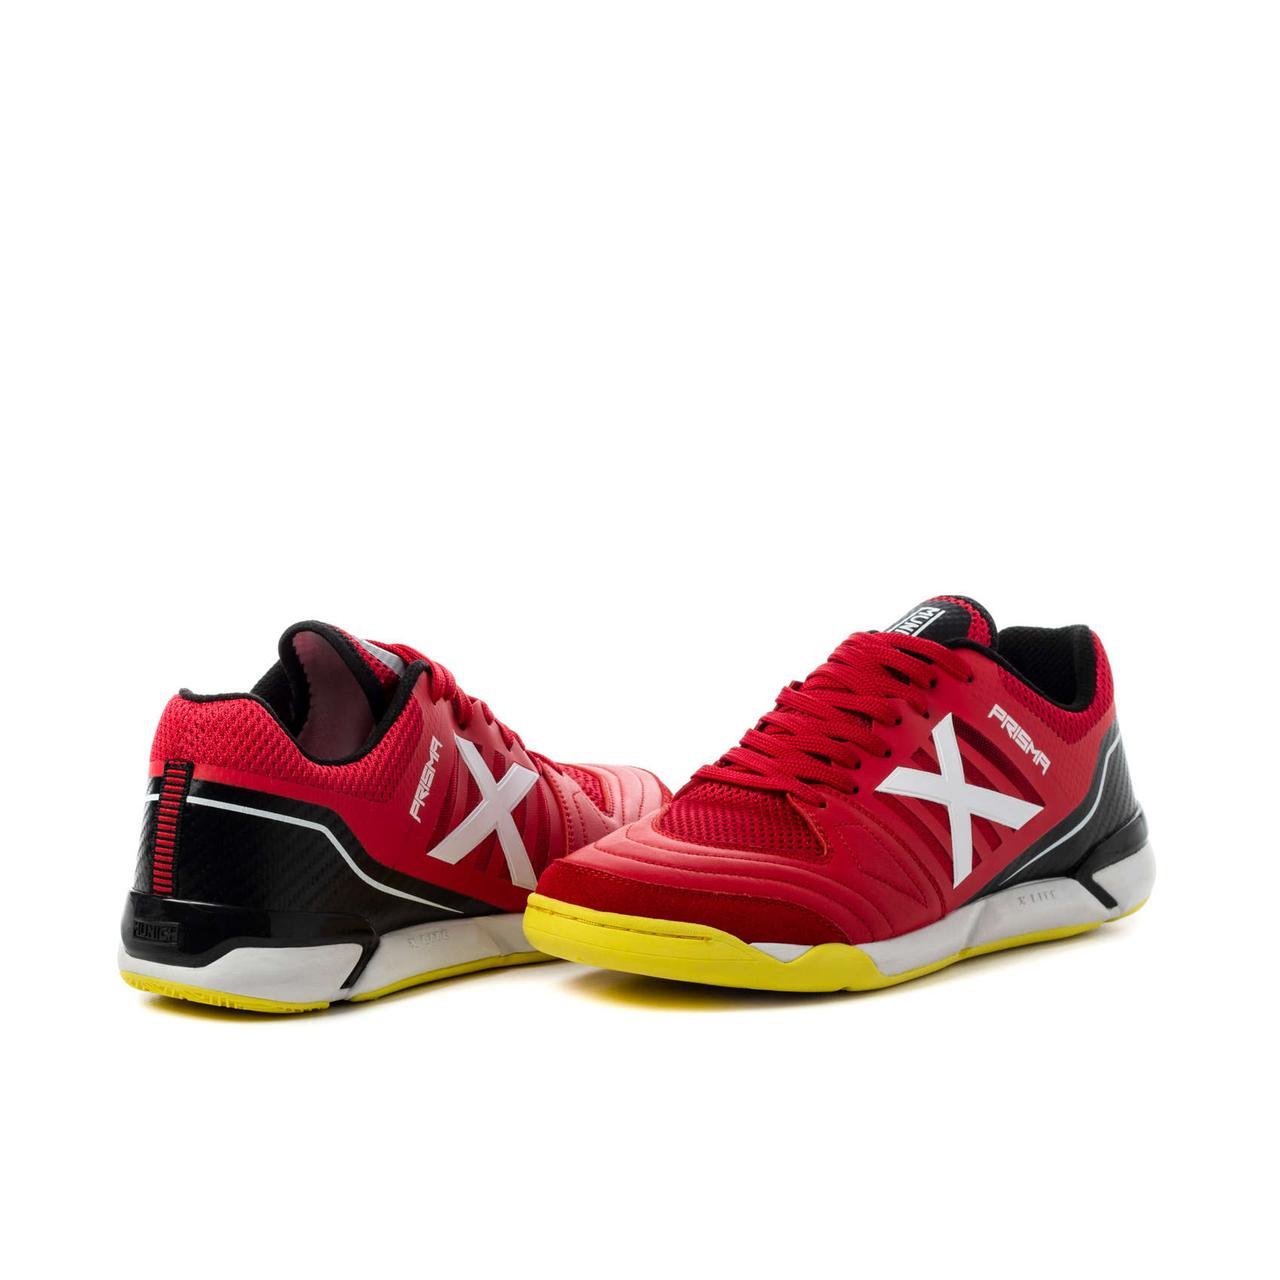 Футзалки MUNICH X PRISMA 02, обувь для зала.